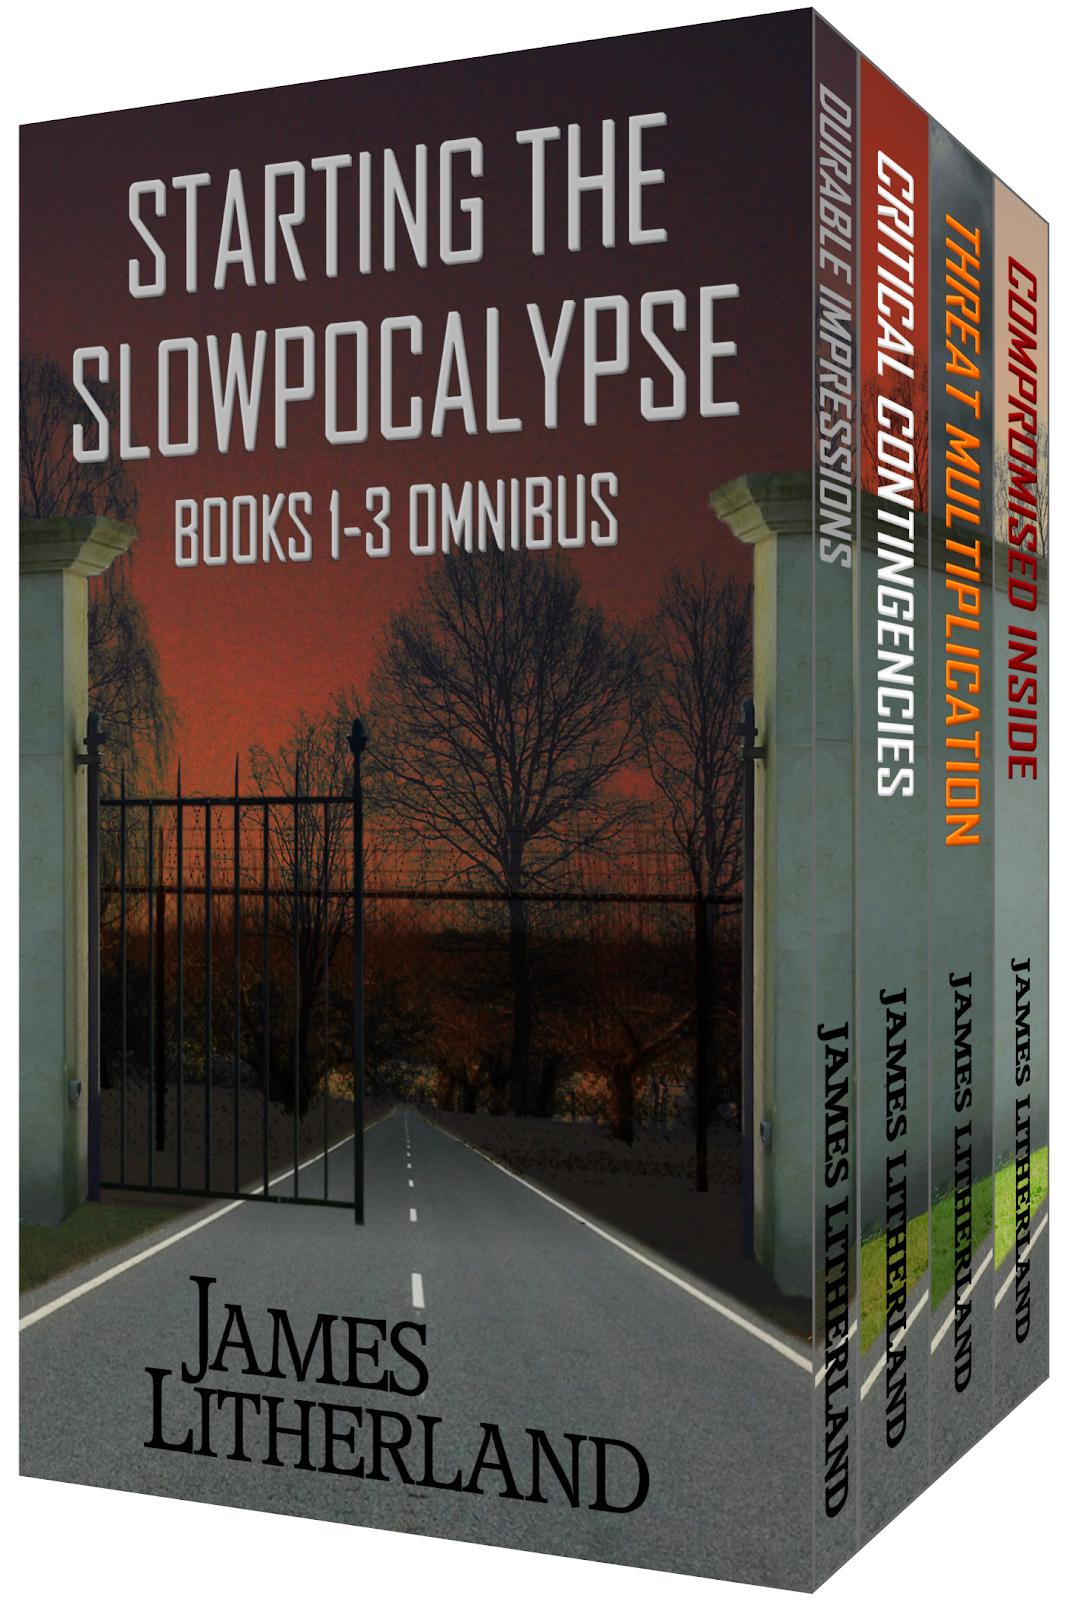 The Slowpocalypse Omnibus